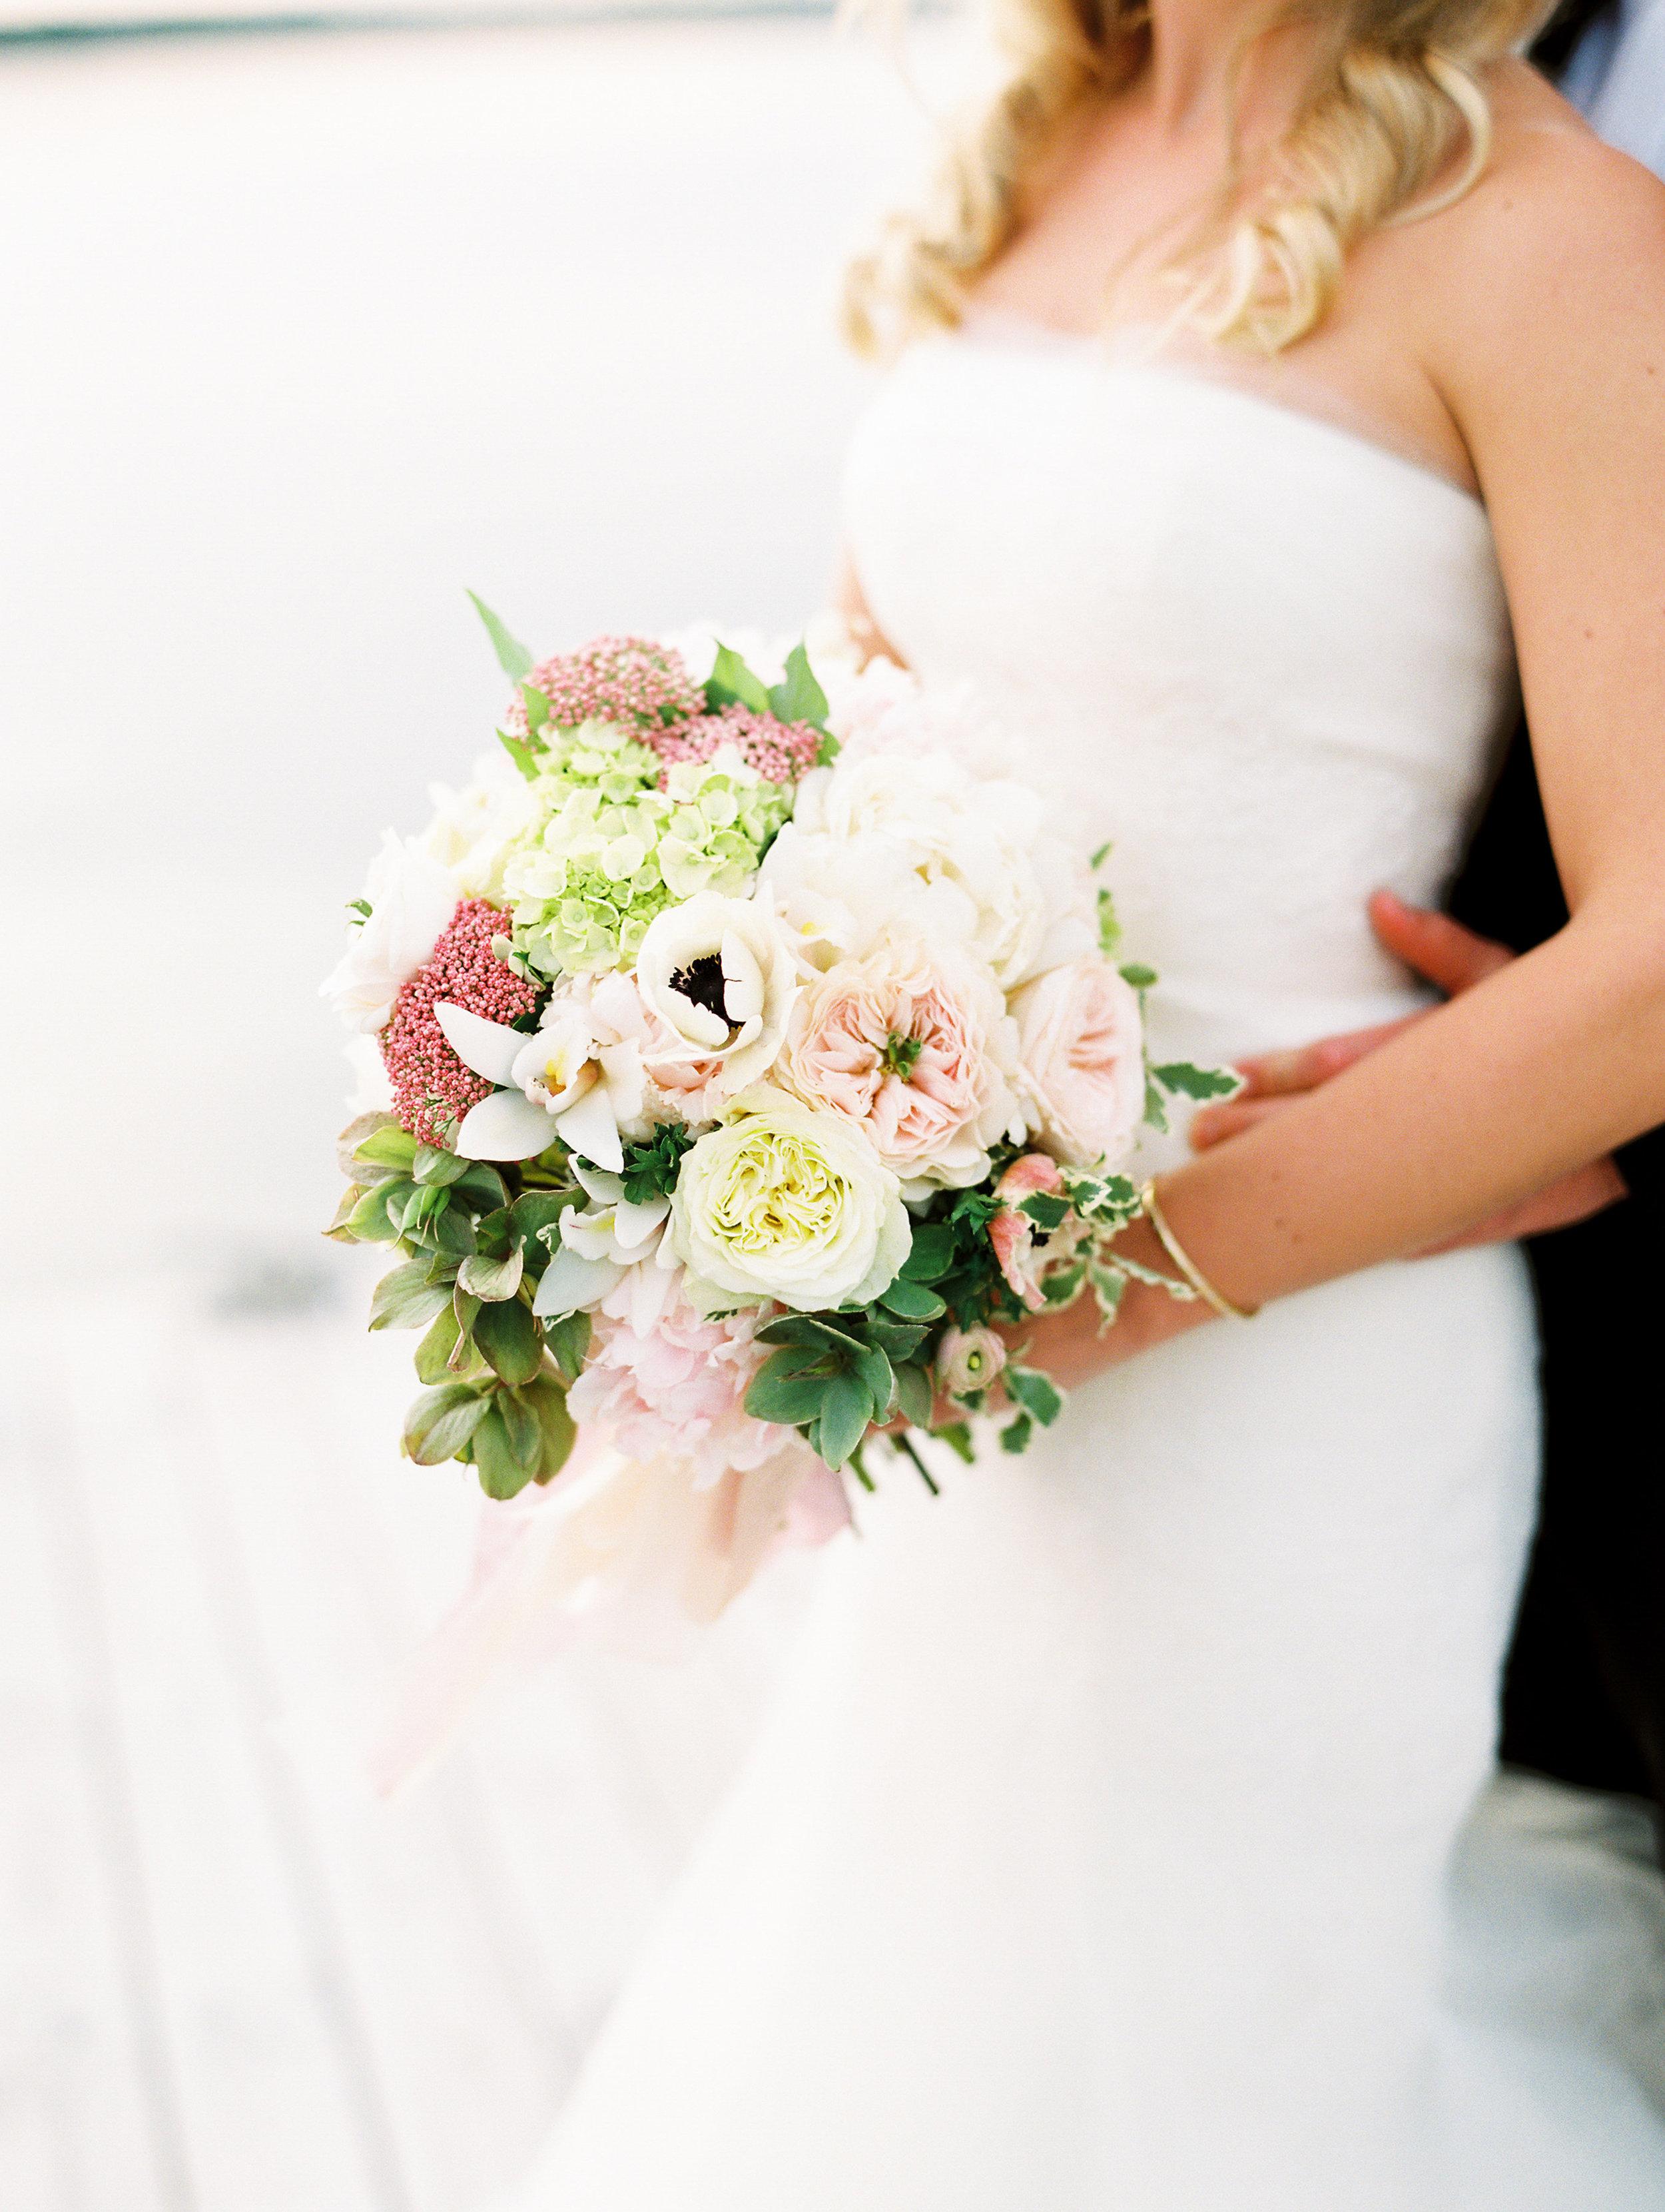 Coffman+Wedding+Bride+Groom+Sunset-72.jpg